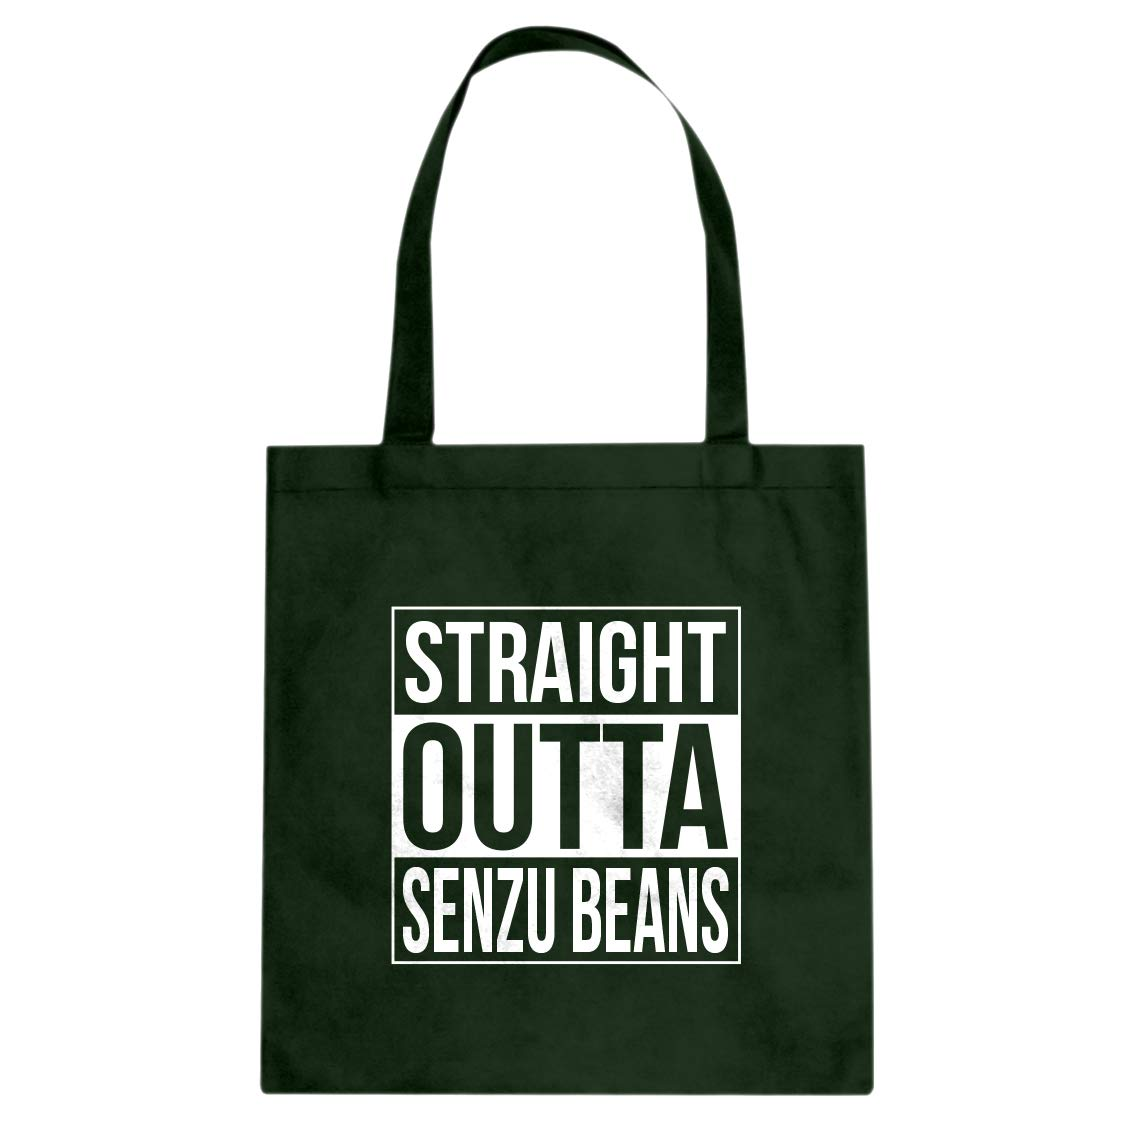 Indica Plateau Straight Outta Senzu Beans Cotton Canvas Tote Bag